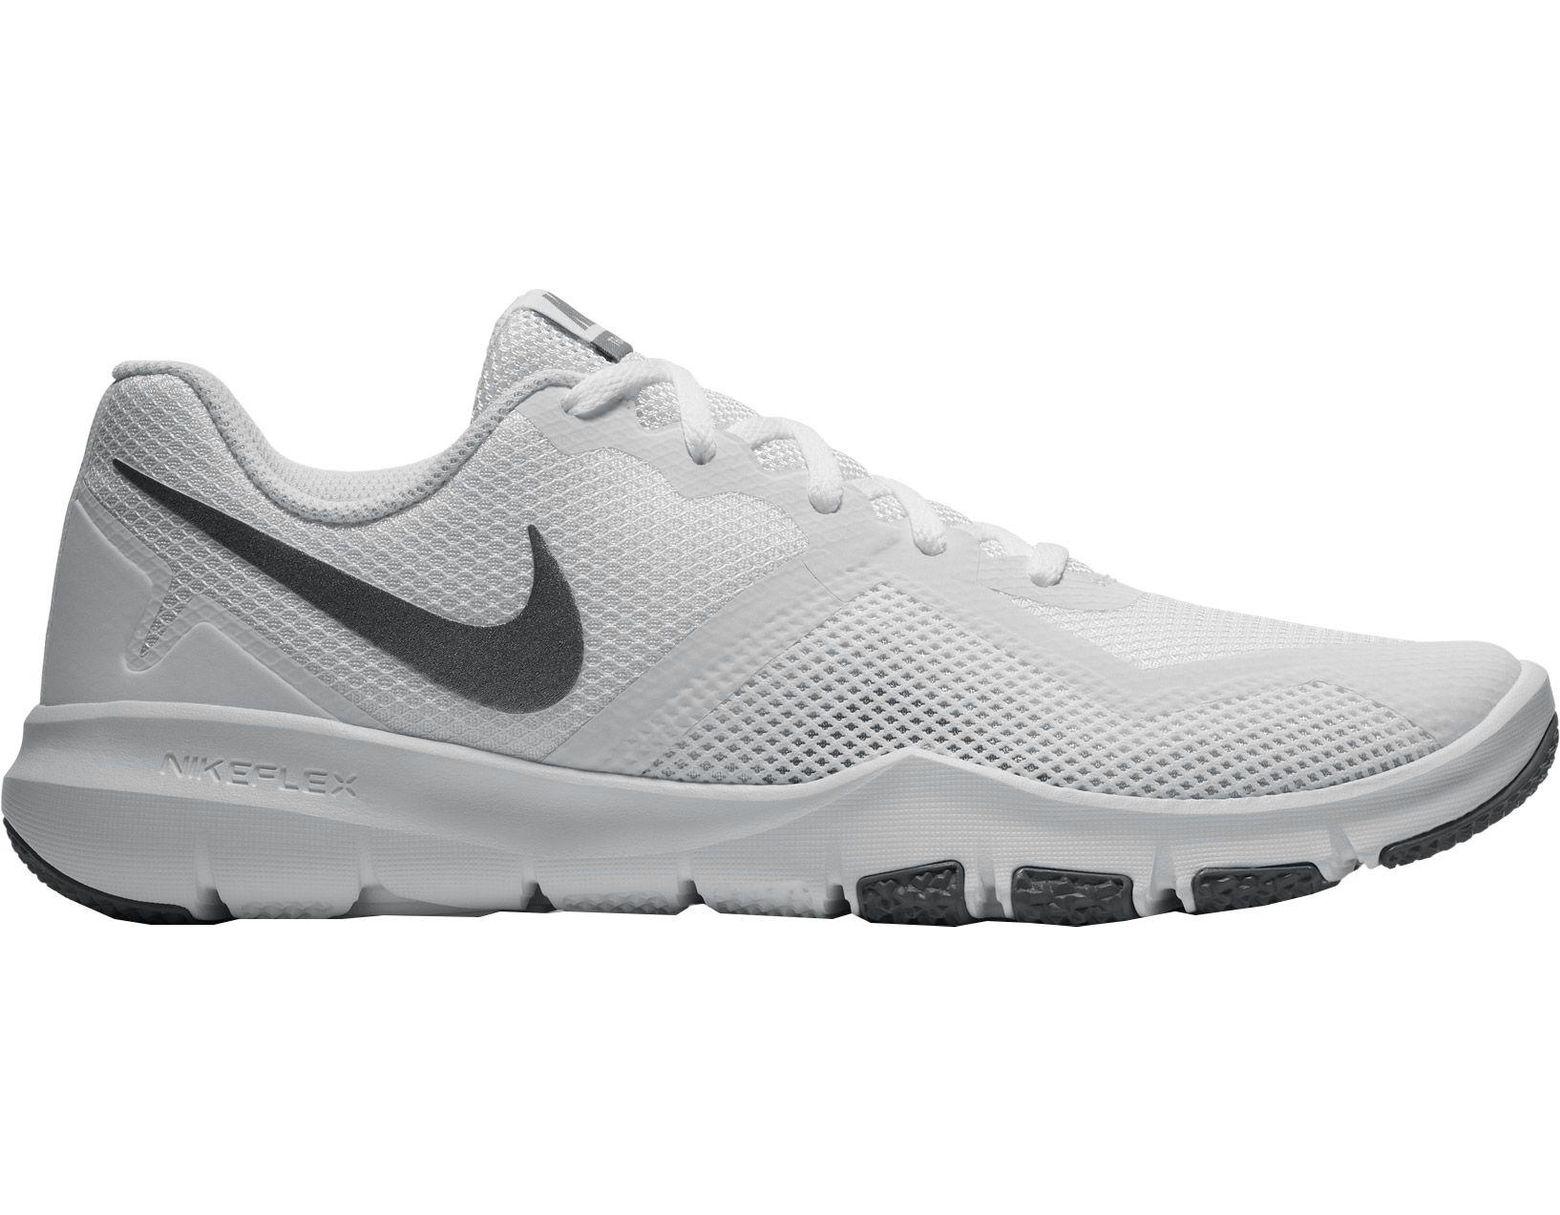 e53c1216062d0 Lyst - Nike Flex Control Ii Training Shoes for Men - Save 32%